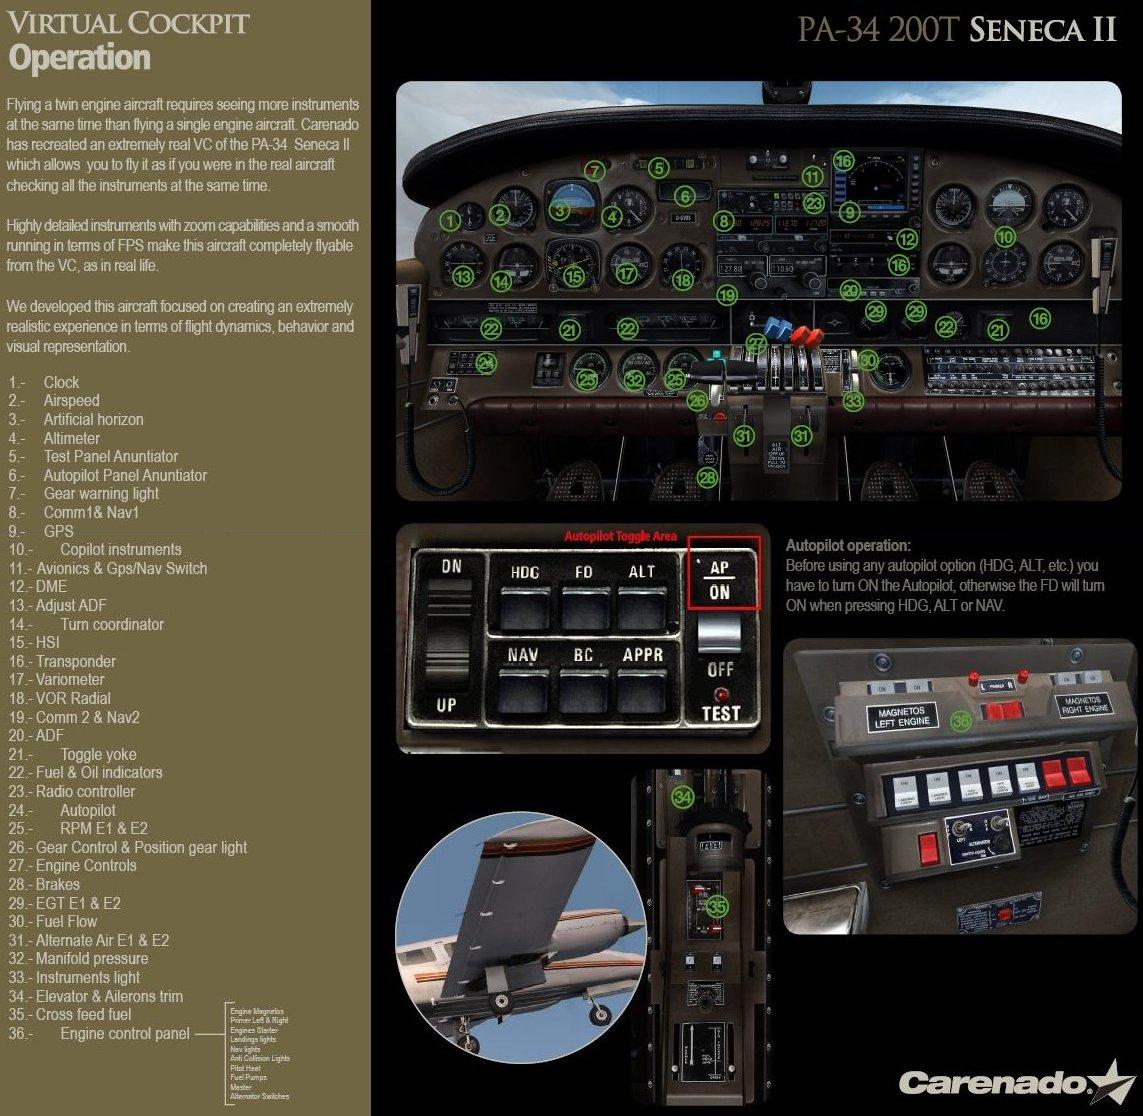 Piper PA-34-200T Seneca II Tutorial & Checklist | FS Brasil